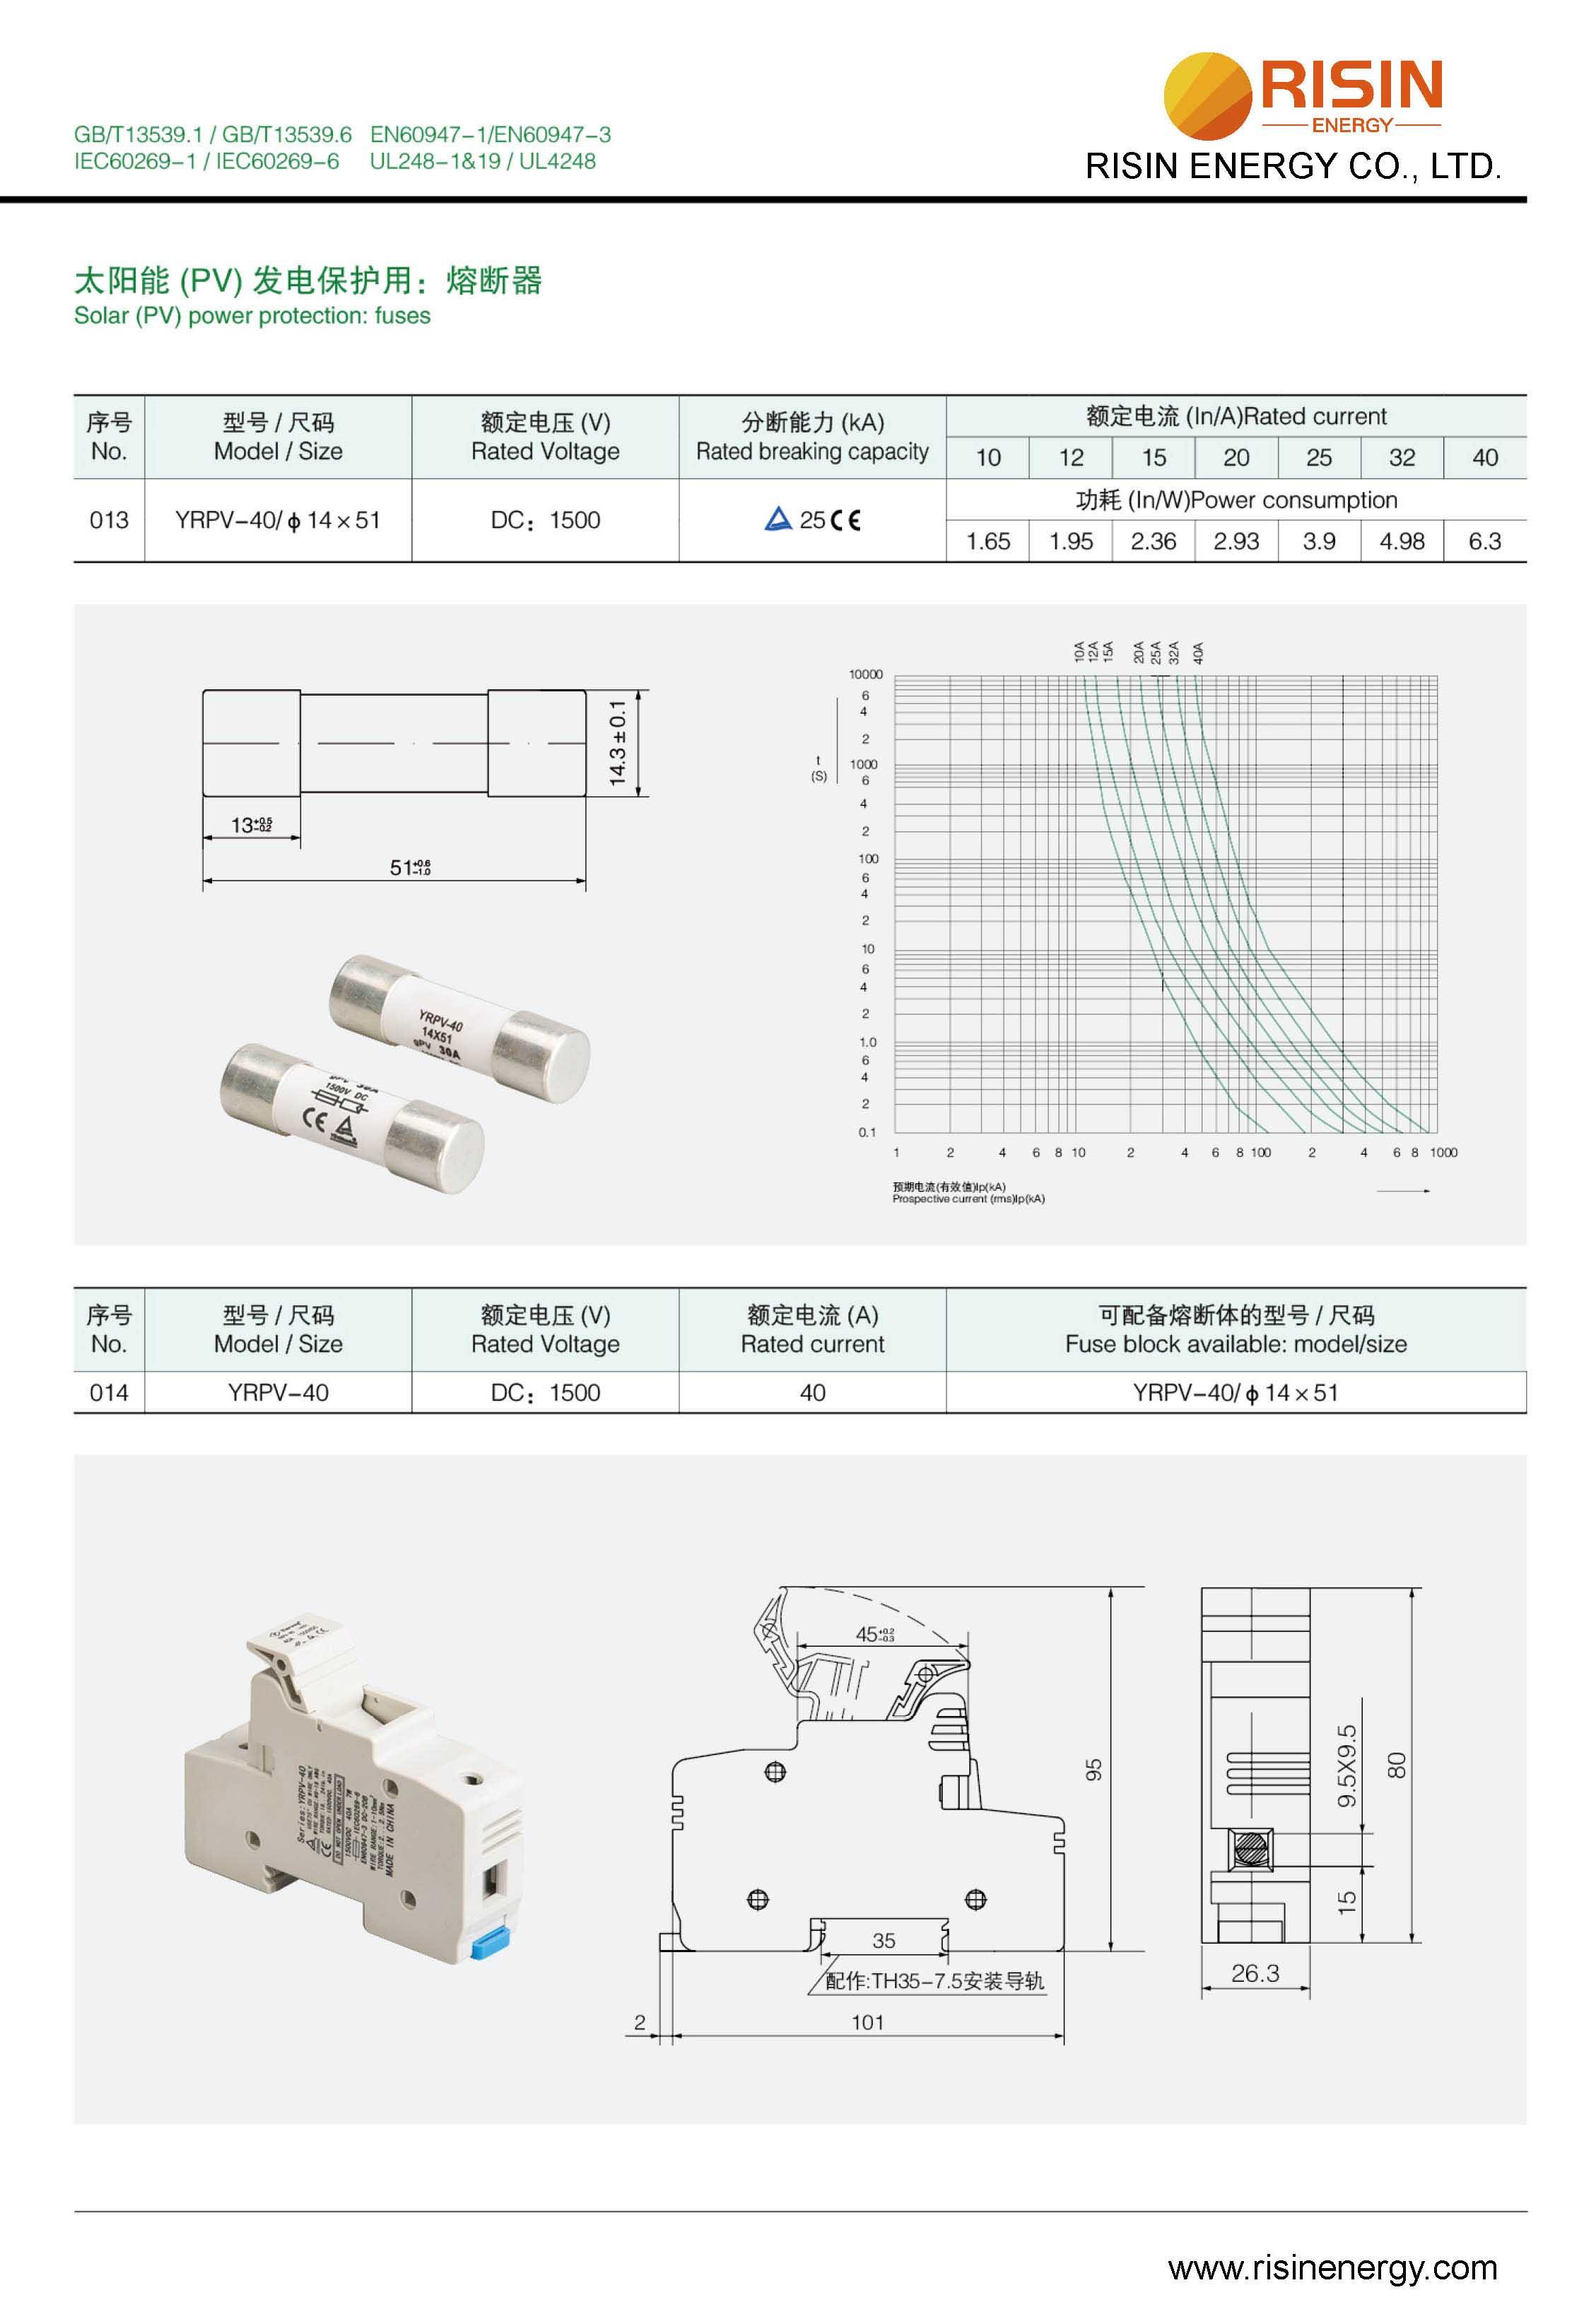 14x51mm 1500V Solar Fuse and Fuse holder